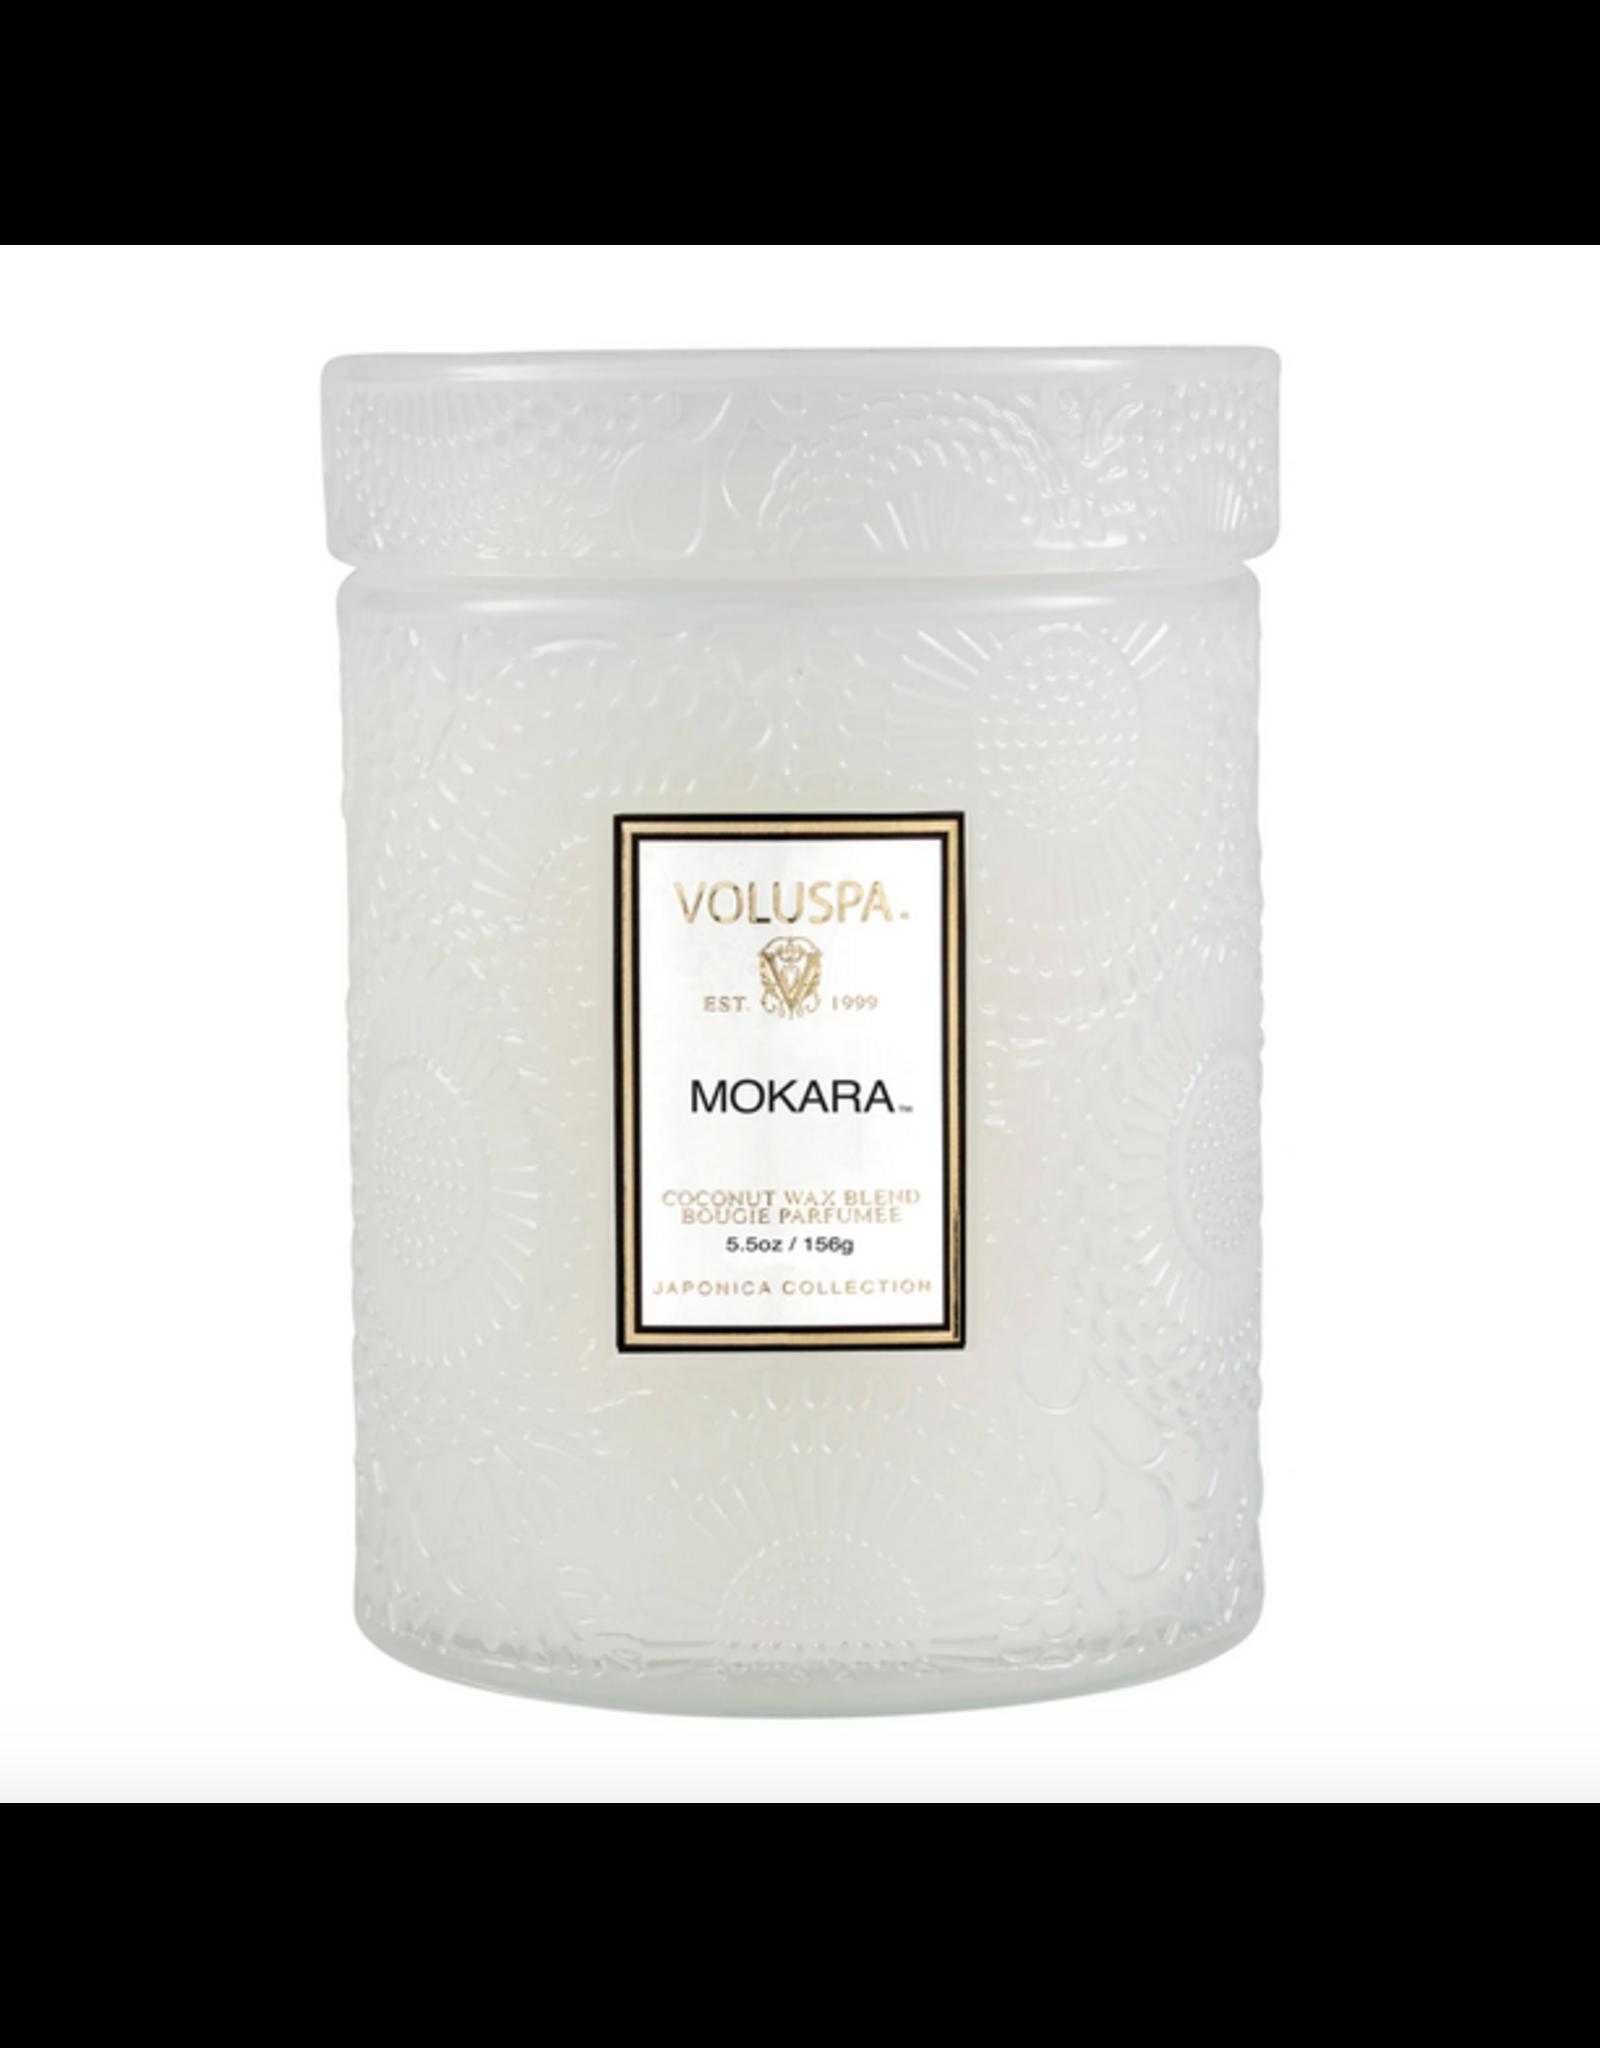 Voluspa Mokara Small Jar Glass Candle